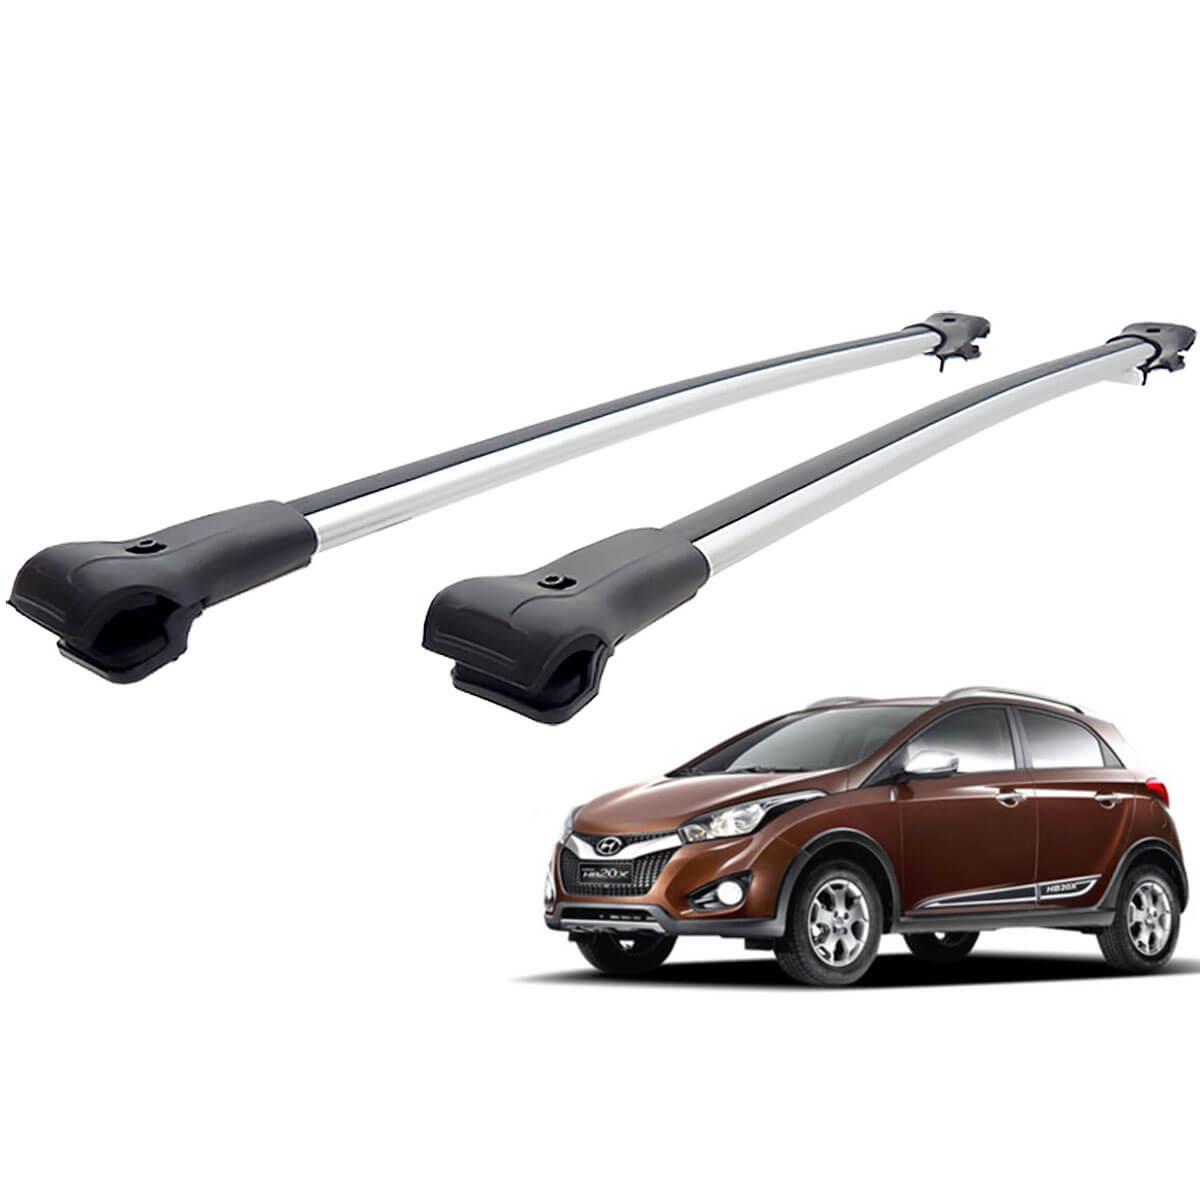 Travessa rack de teto larga alumínio HB20X 2014 a 2018